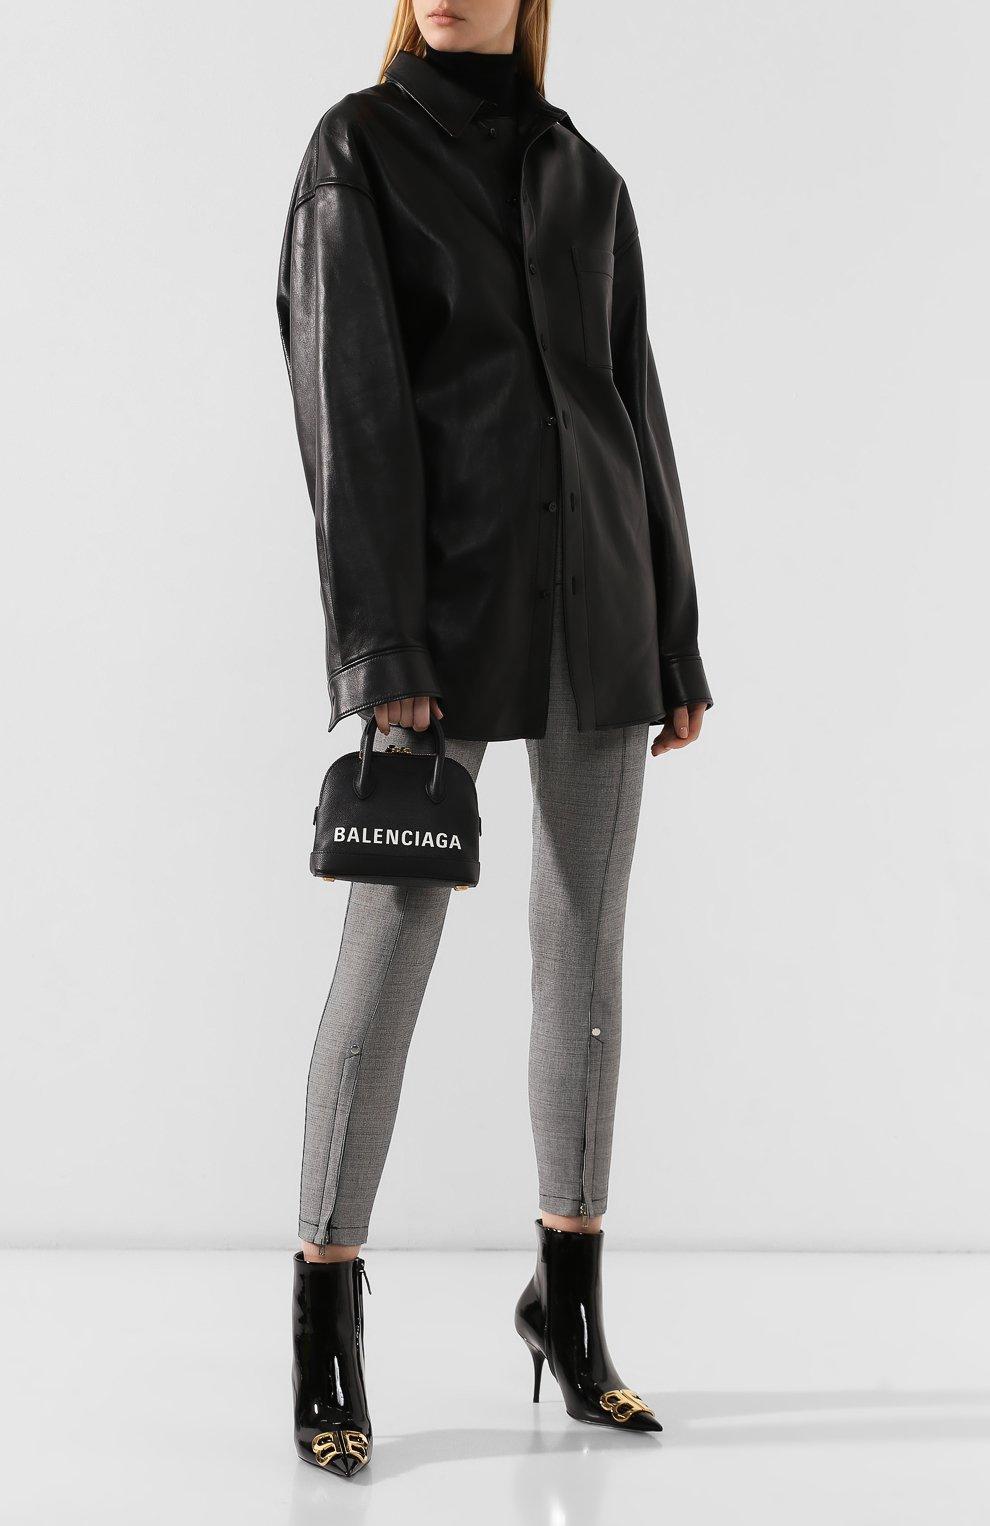 Сумка Ville XXS Balenciaga черная цвета | Фото №2